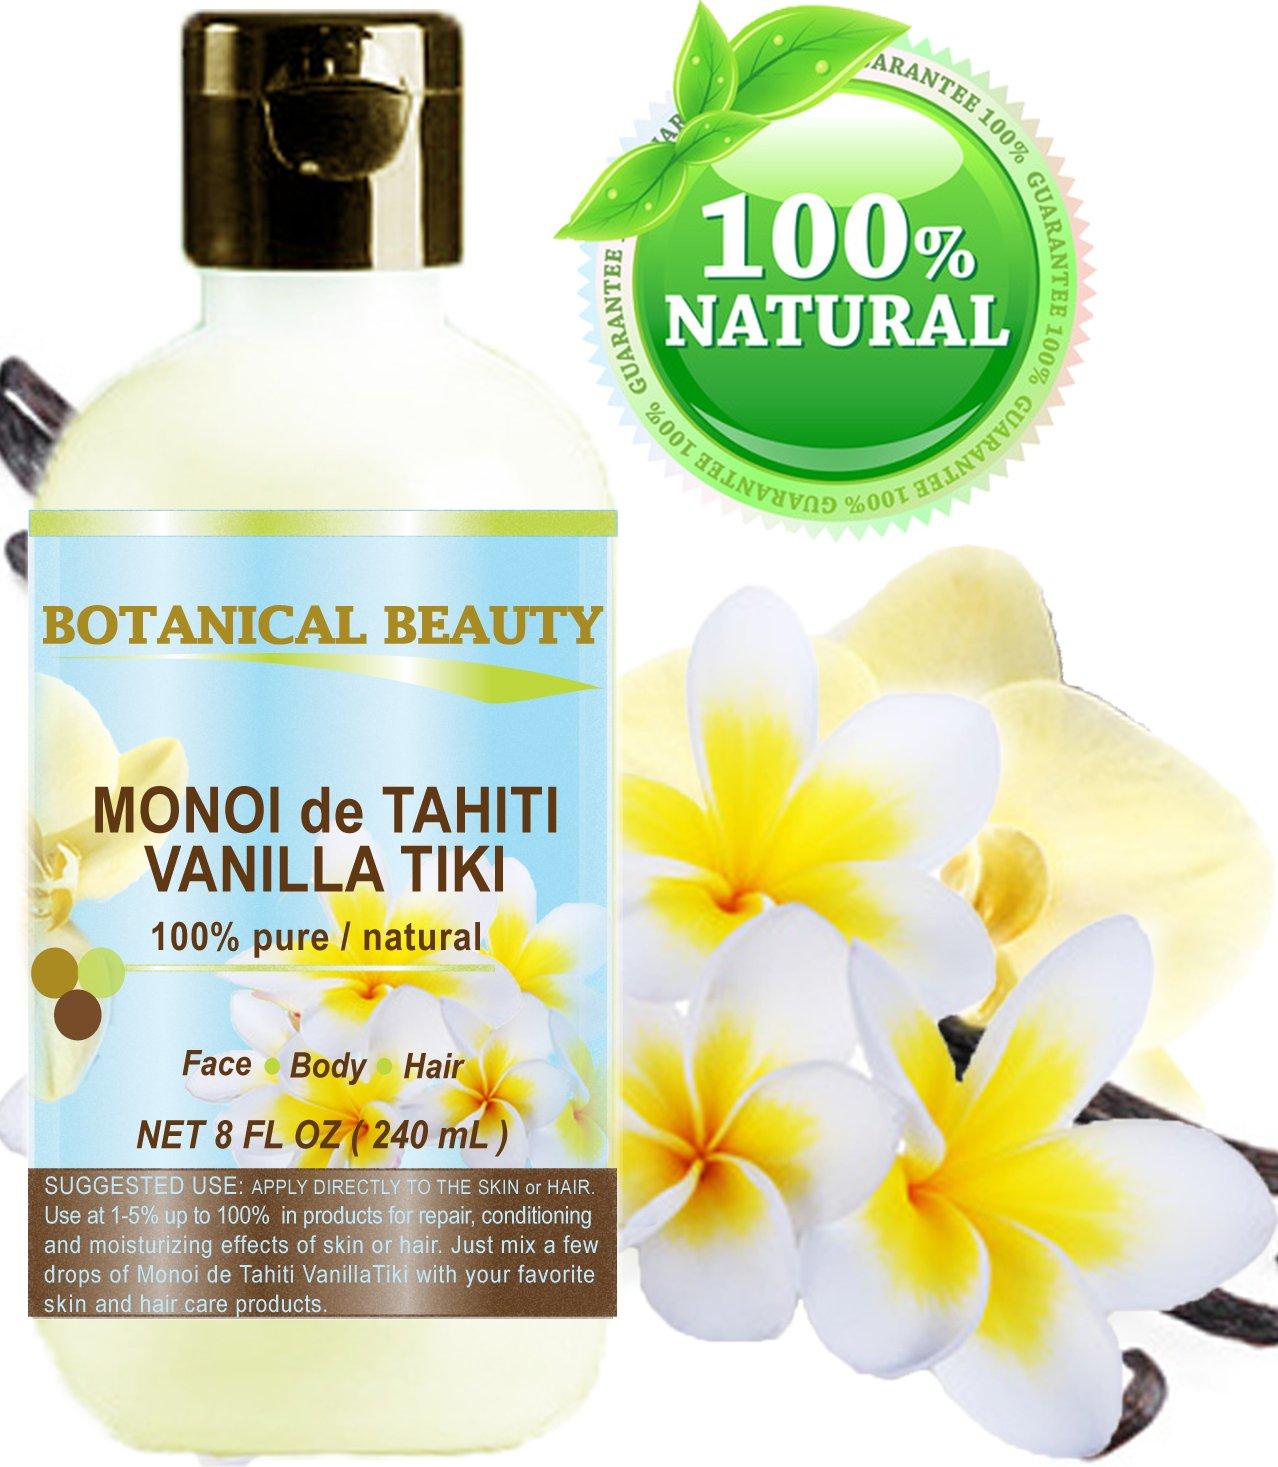 MONOI de TAHITI VANILLA TIKI OIL 100% Natural / 100% PURE BOTANICALS. 8 Fl.oz.- 240 ml. For FACE, BODY, HANDS, FEET, MASSAGE, NAILS & HAIR and LIP CARE.